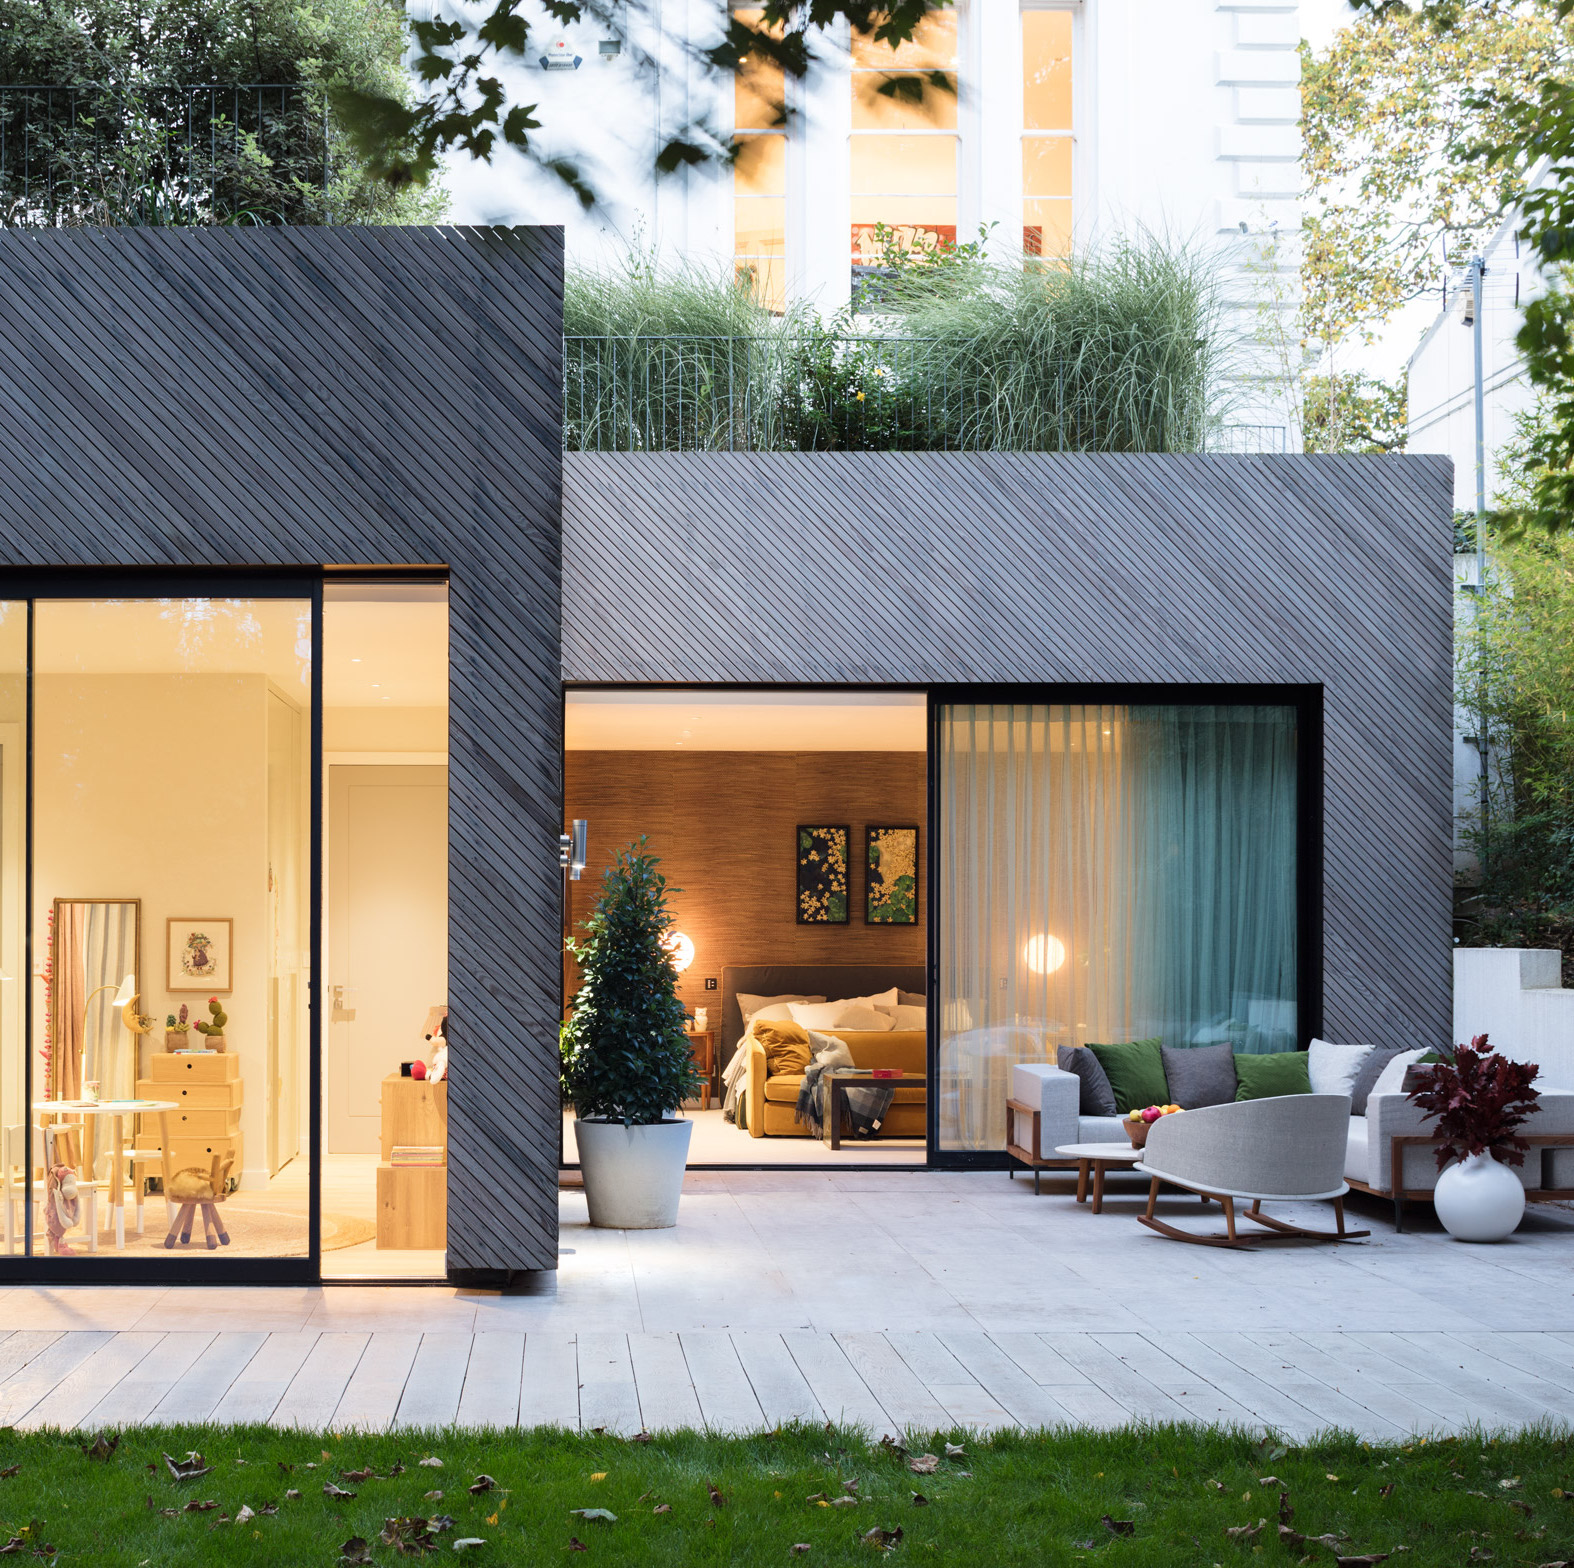 Claridge Architects